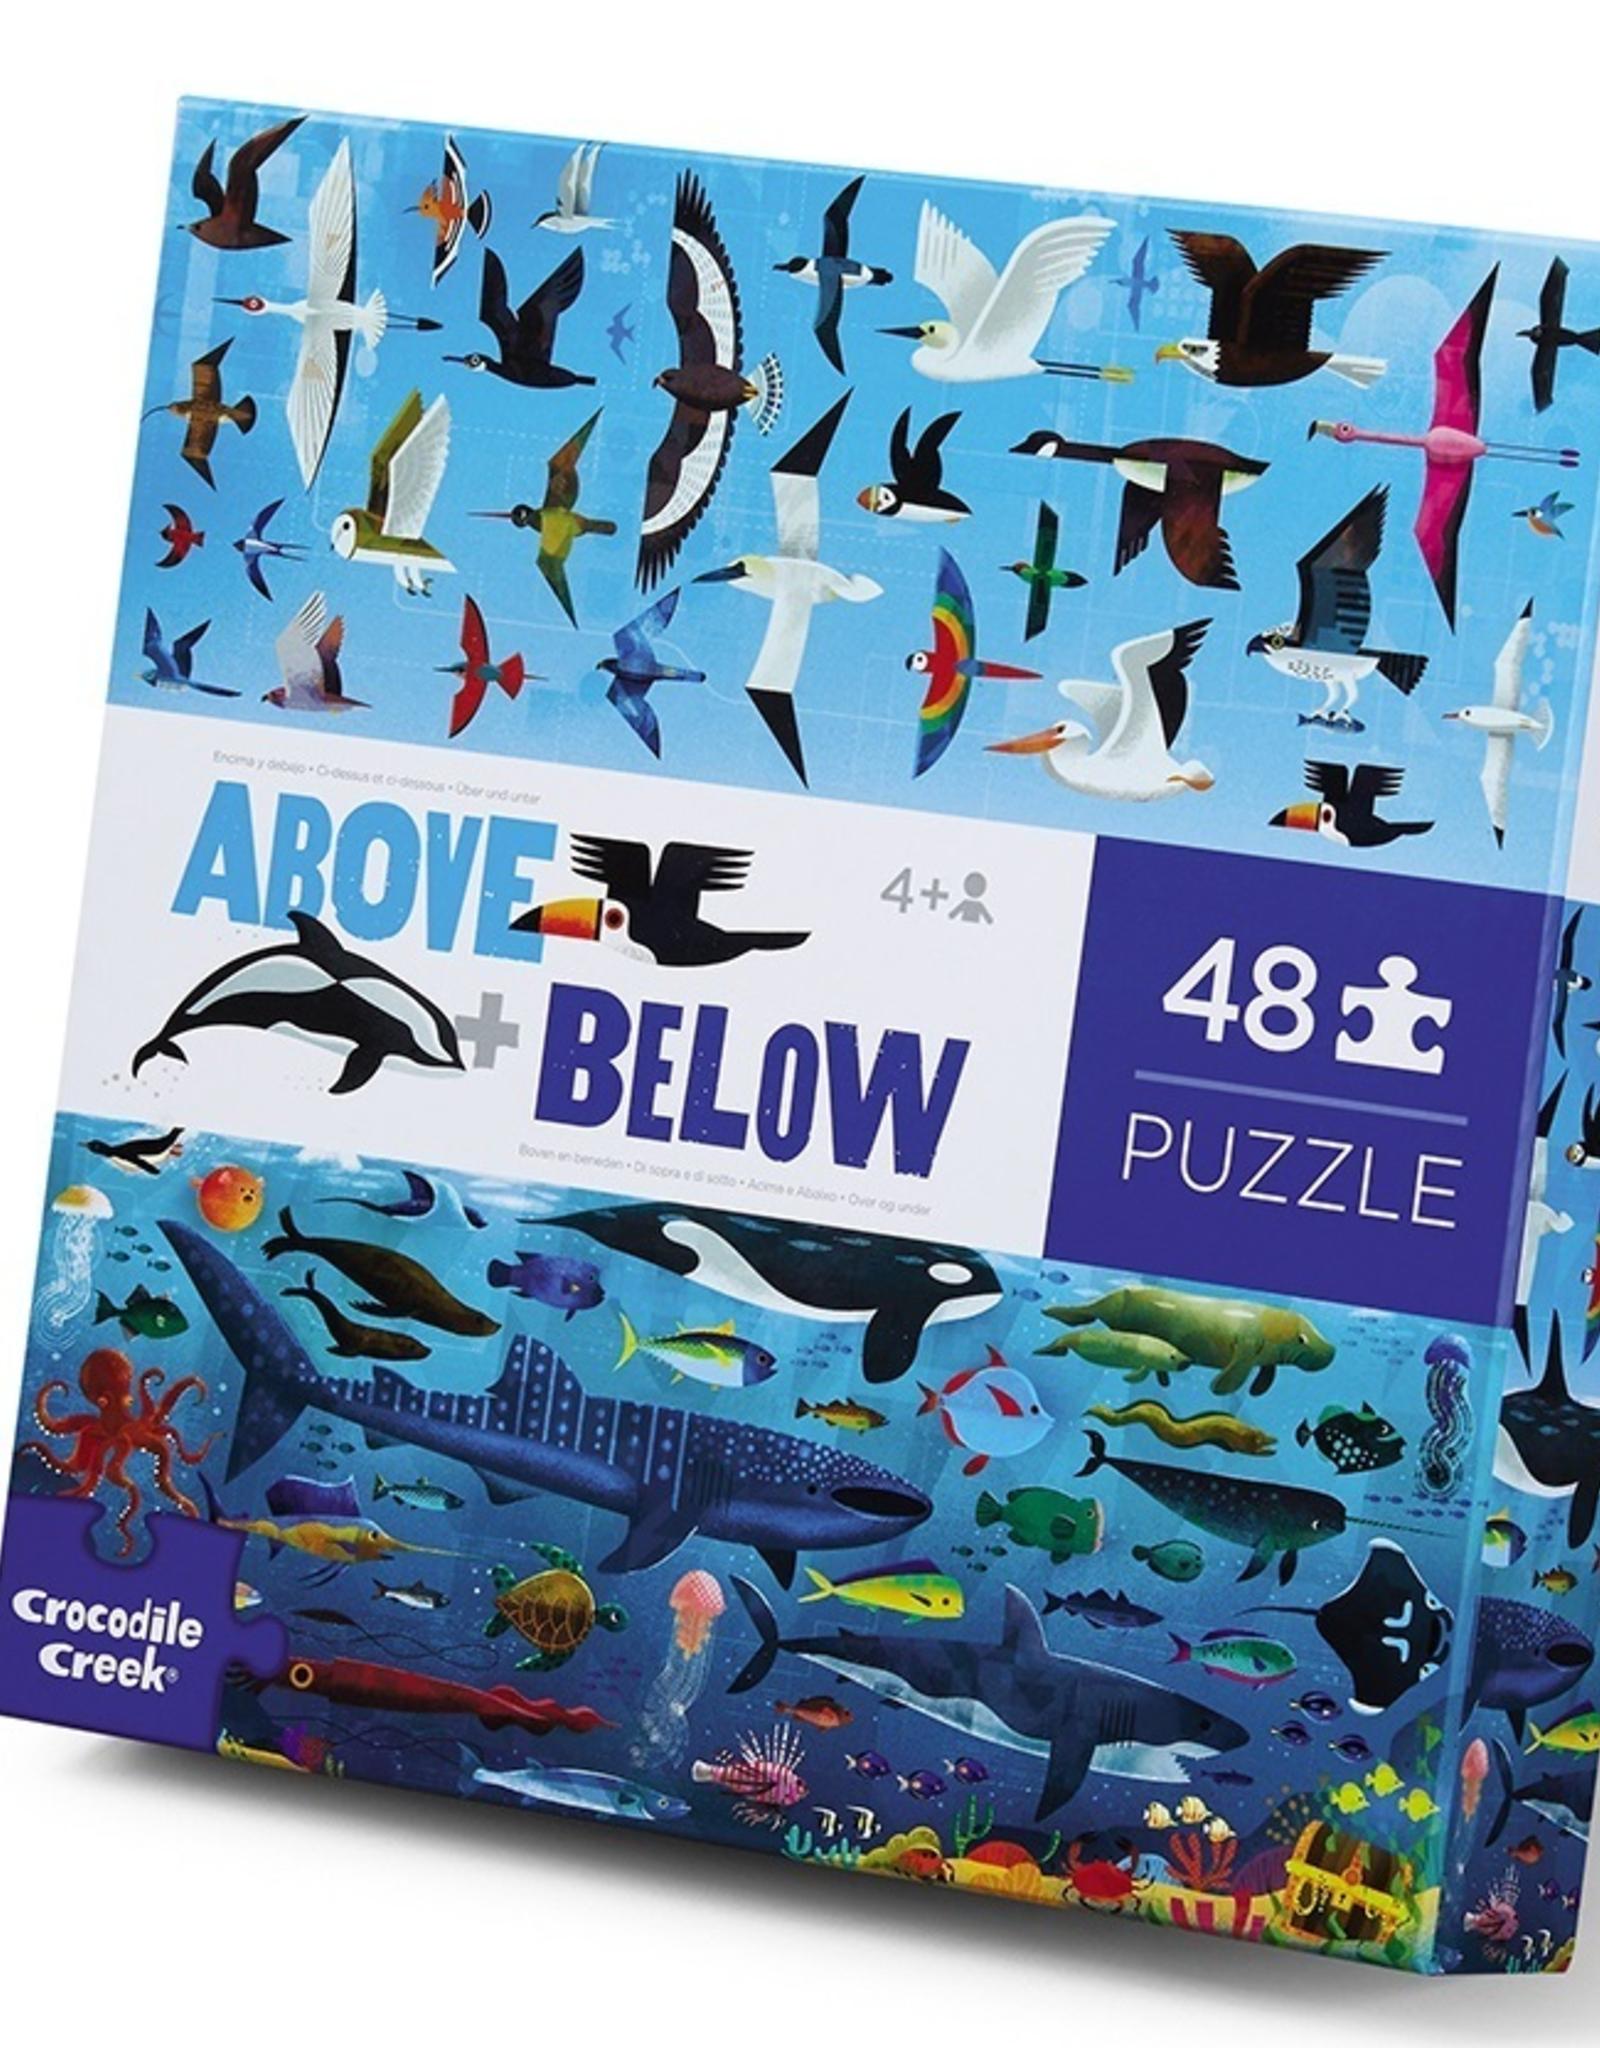 Crocodile Creek 48 pc Puzzle Above and Below: Sea & Sky